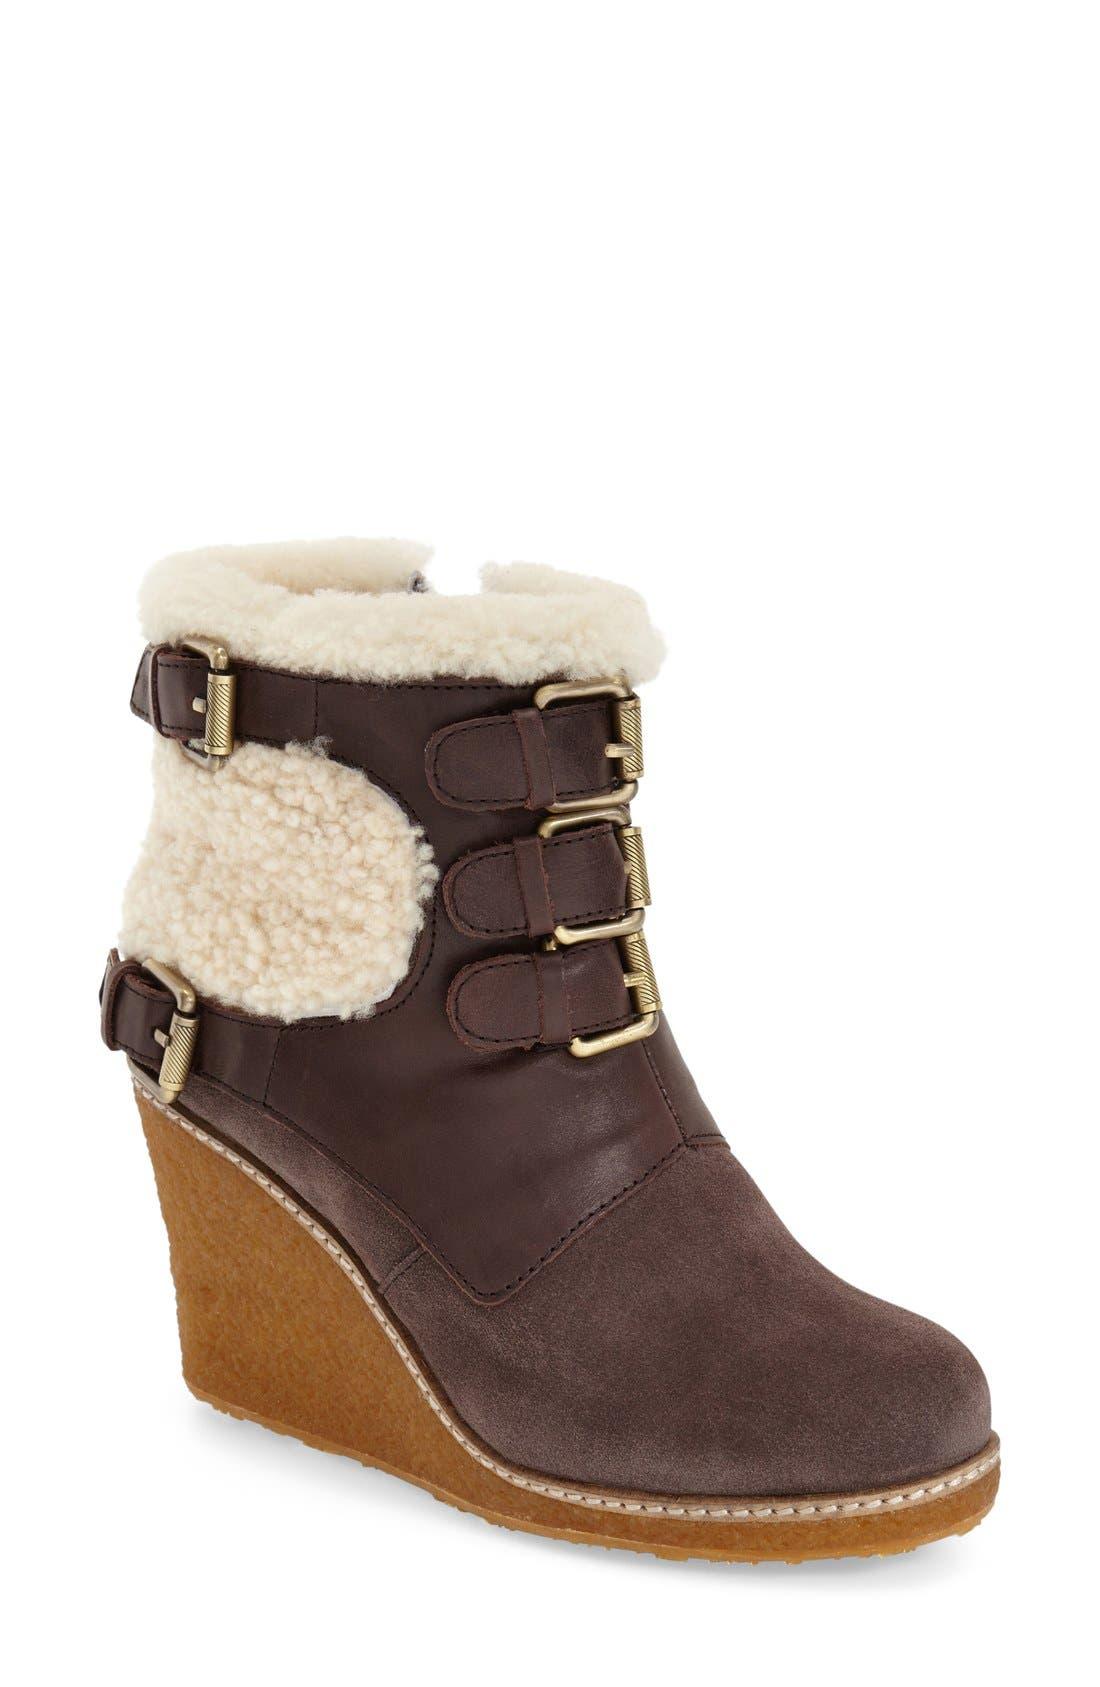 Main Image - Australia Luxe Collective 'Monk' Genuine Calf Hair & Shearling Boot (Women)